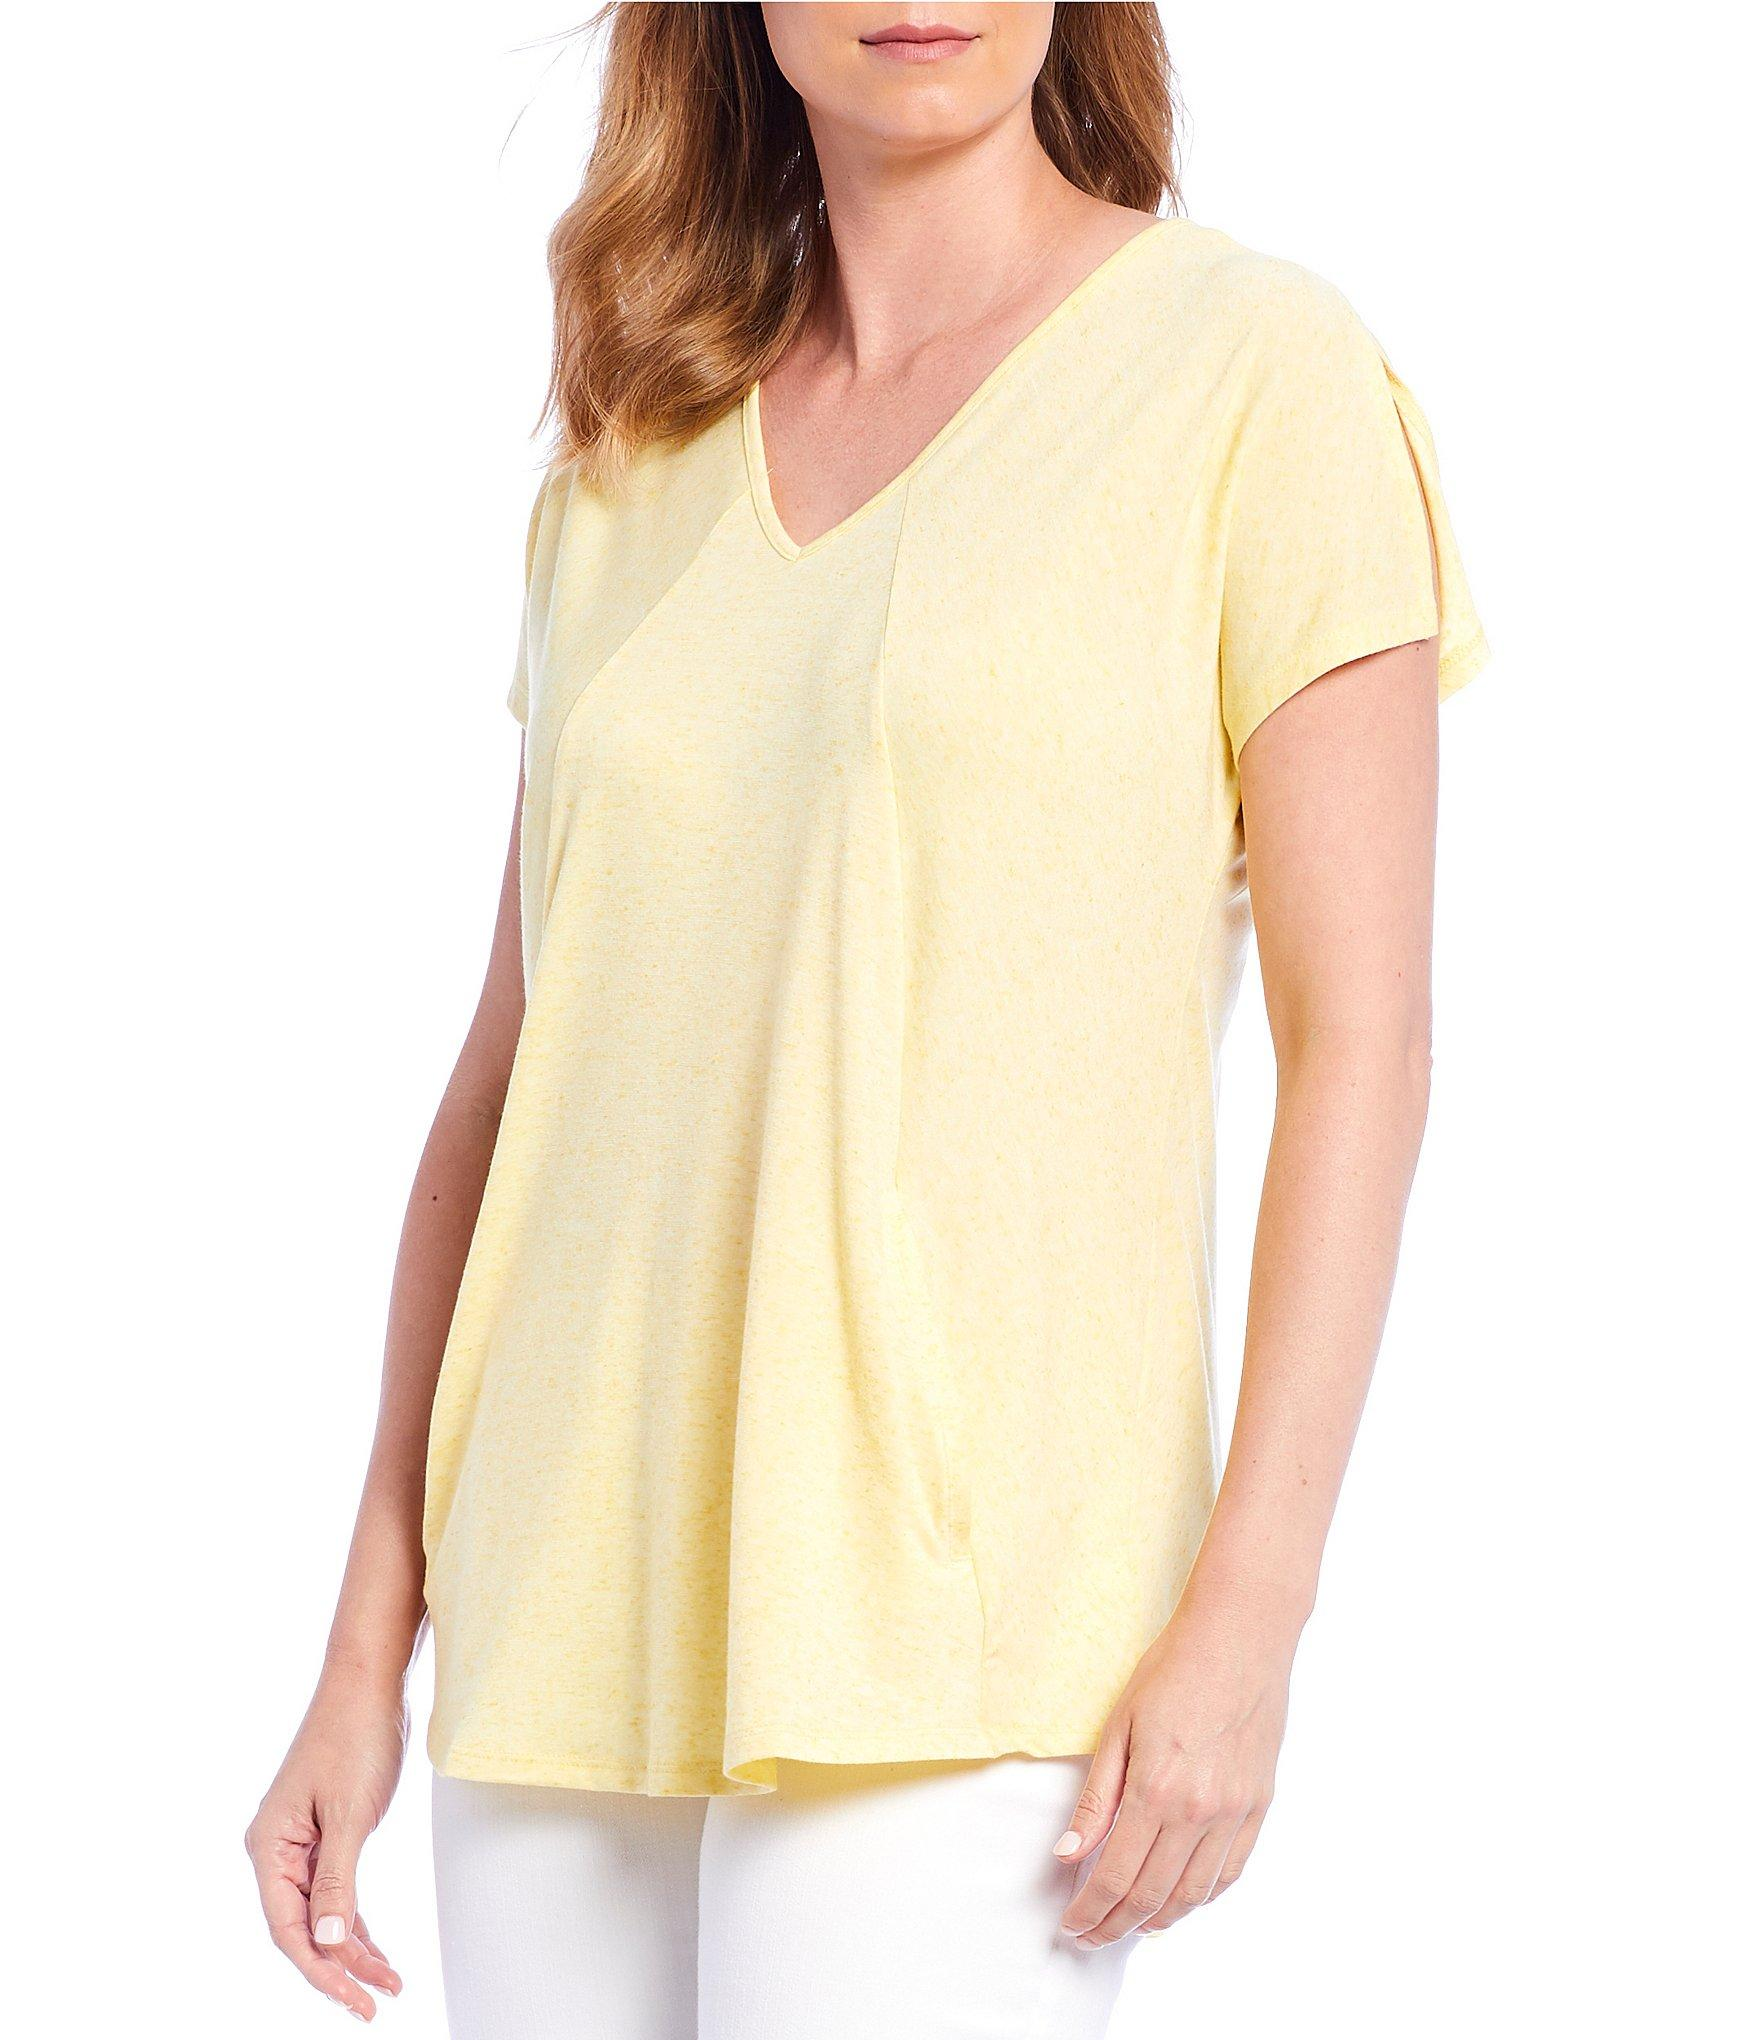 Jones New York Slub Knit Jersey V Neck Seamed Top In Yellow